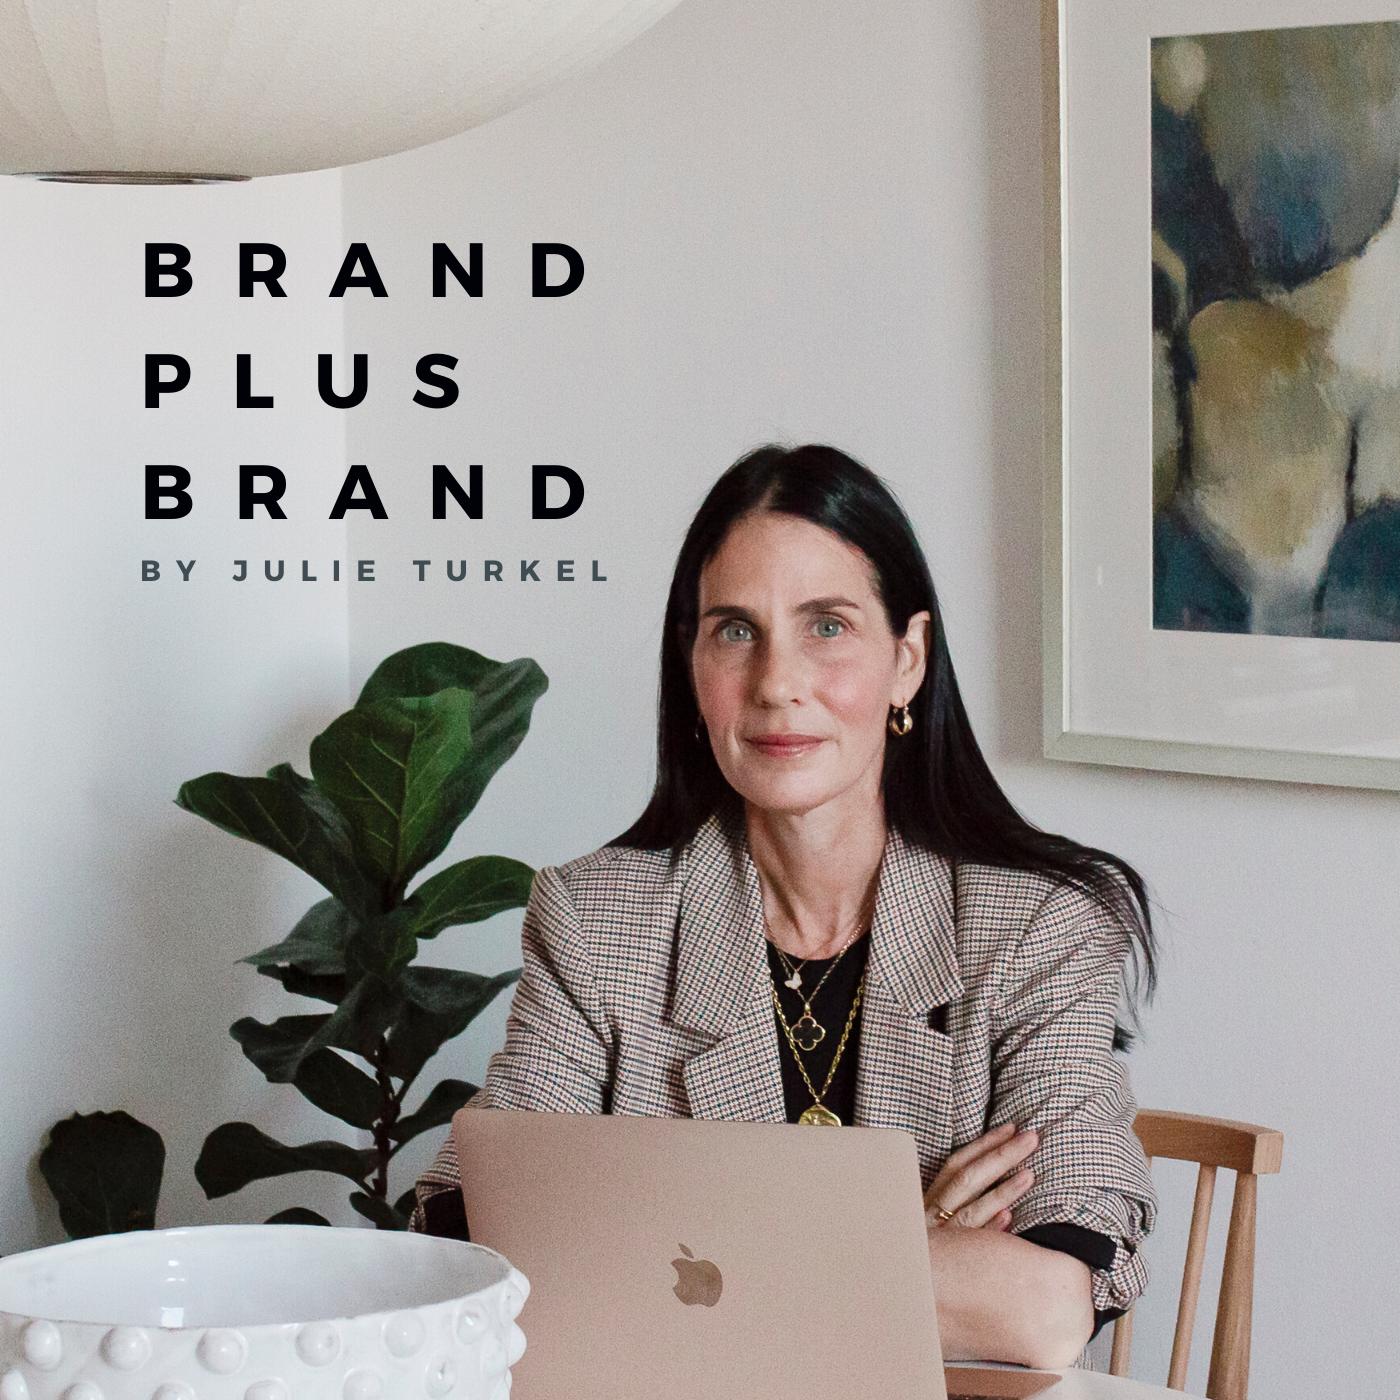 Brand Plus Brand show art